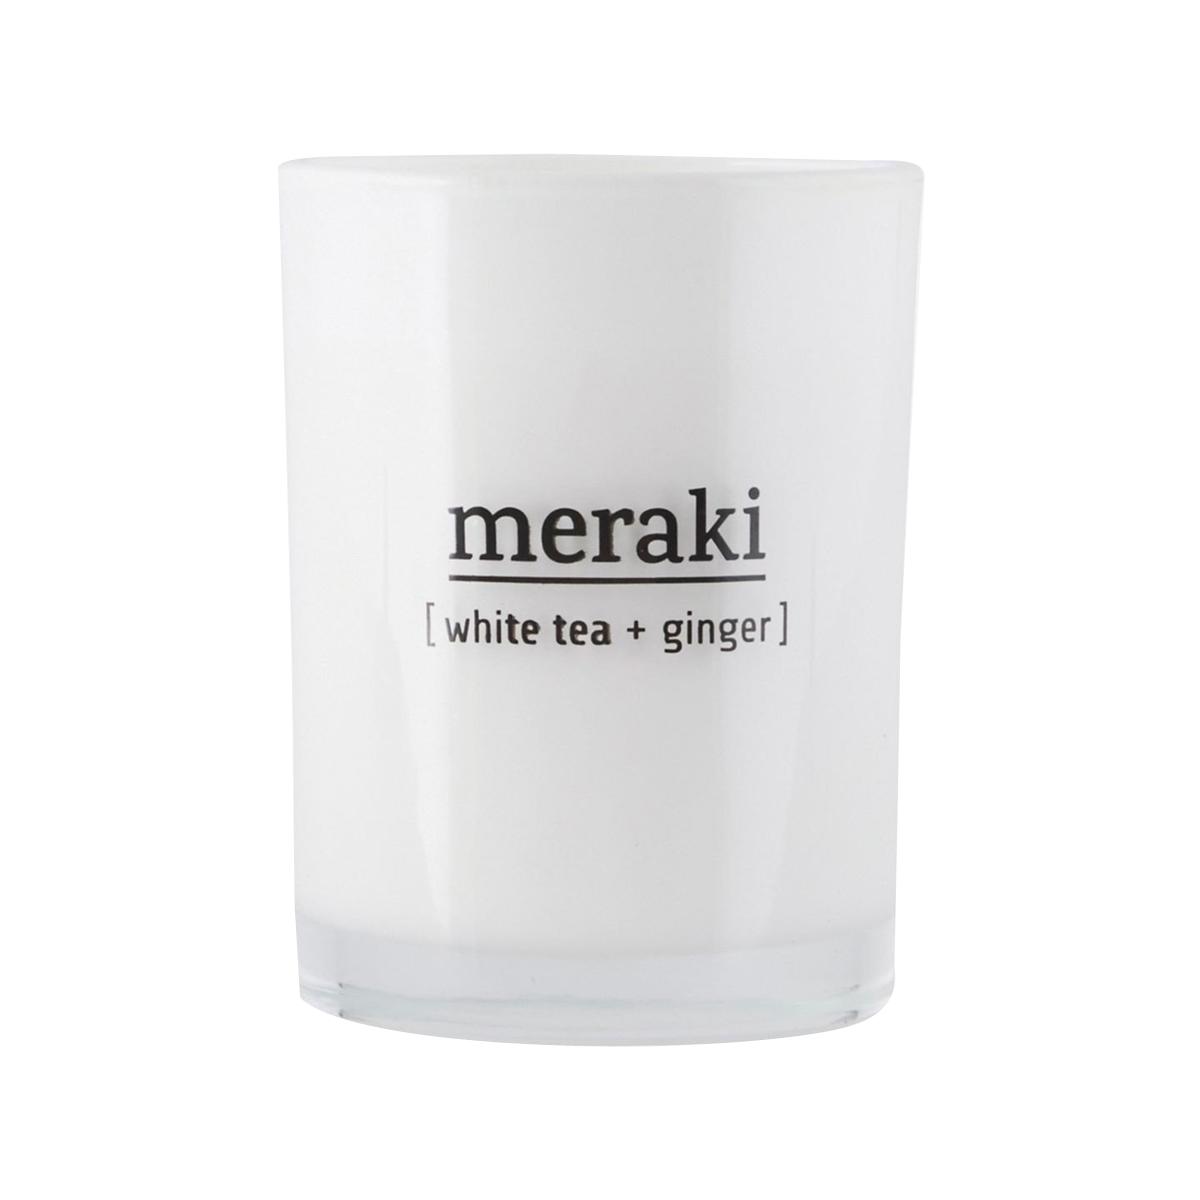 Meraki - Scented Candles - White Tea & Ginger (mkap012/308150012)